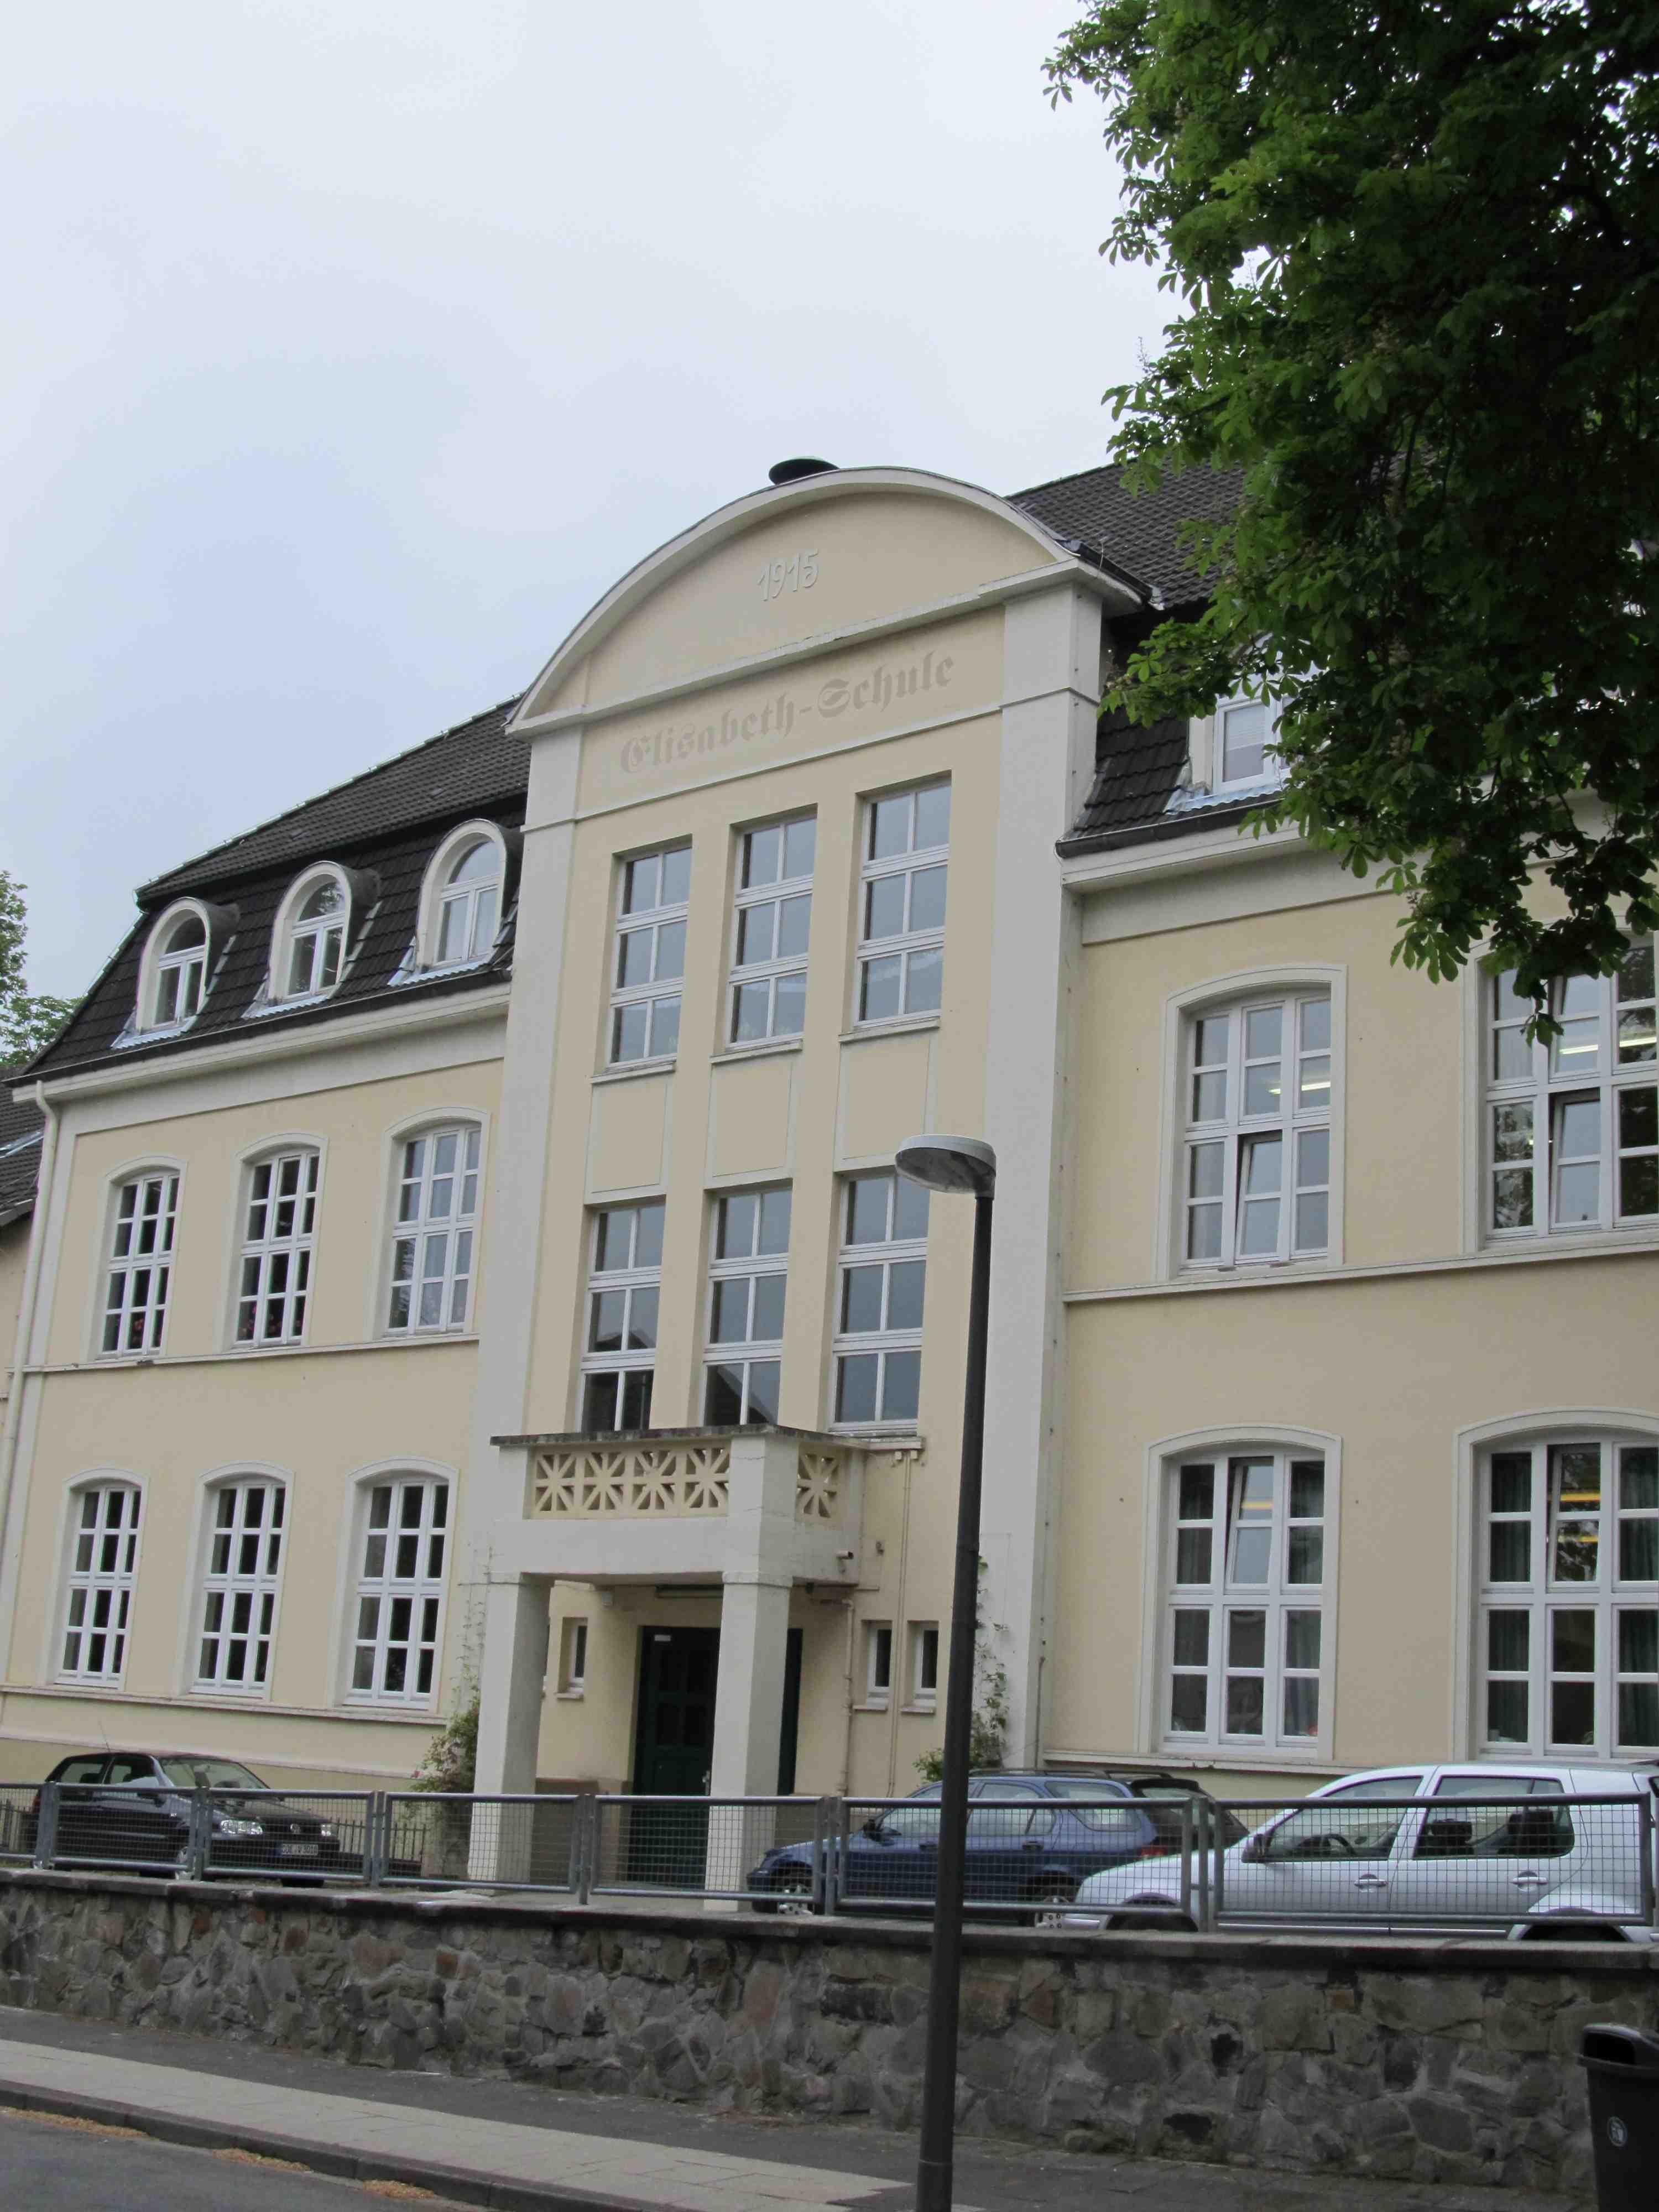 Malerbetrieb Bernd Boltsch